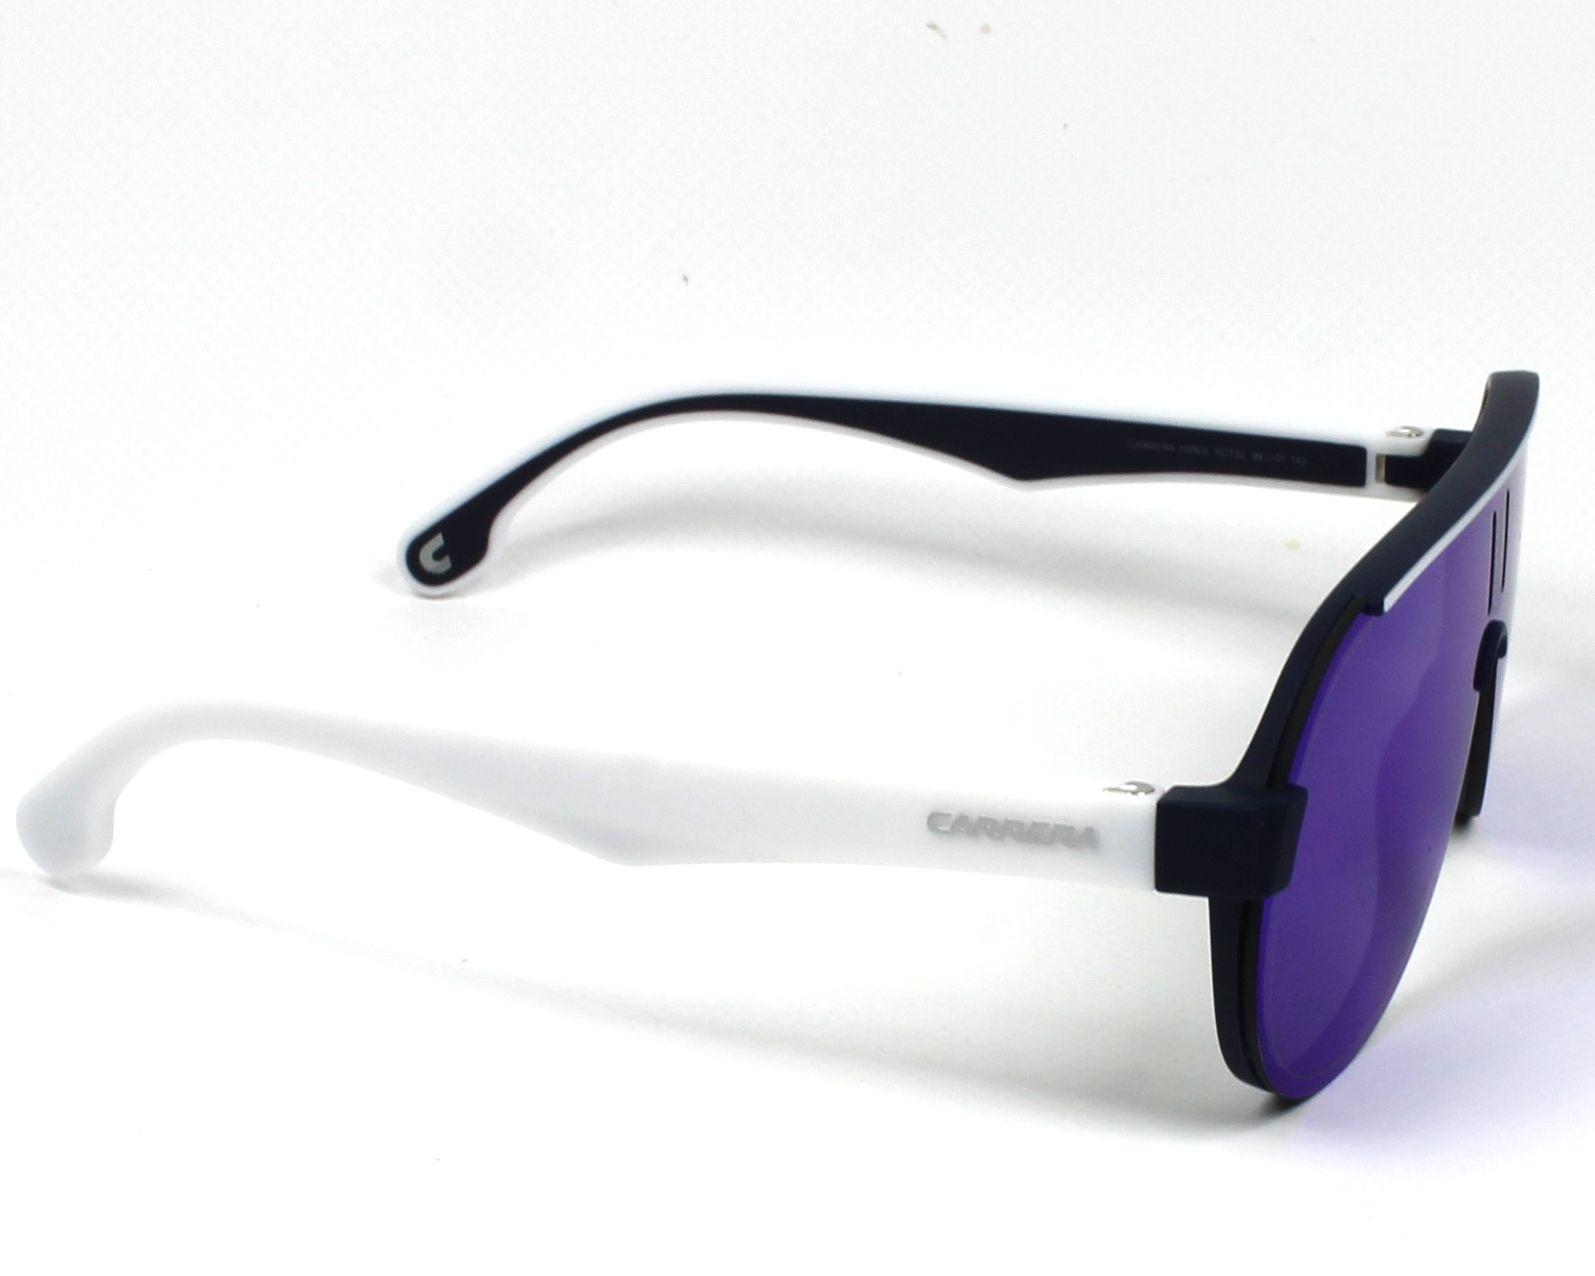 bdb03ebb08 Gafas de sol Carrera 1008-S RCT/Z0 99- Azul Blanco vista lateral